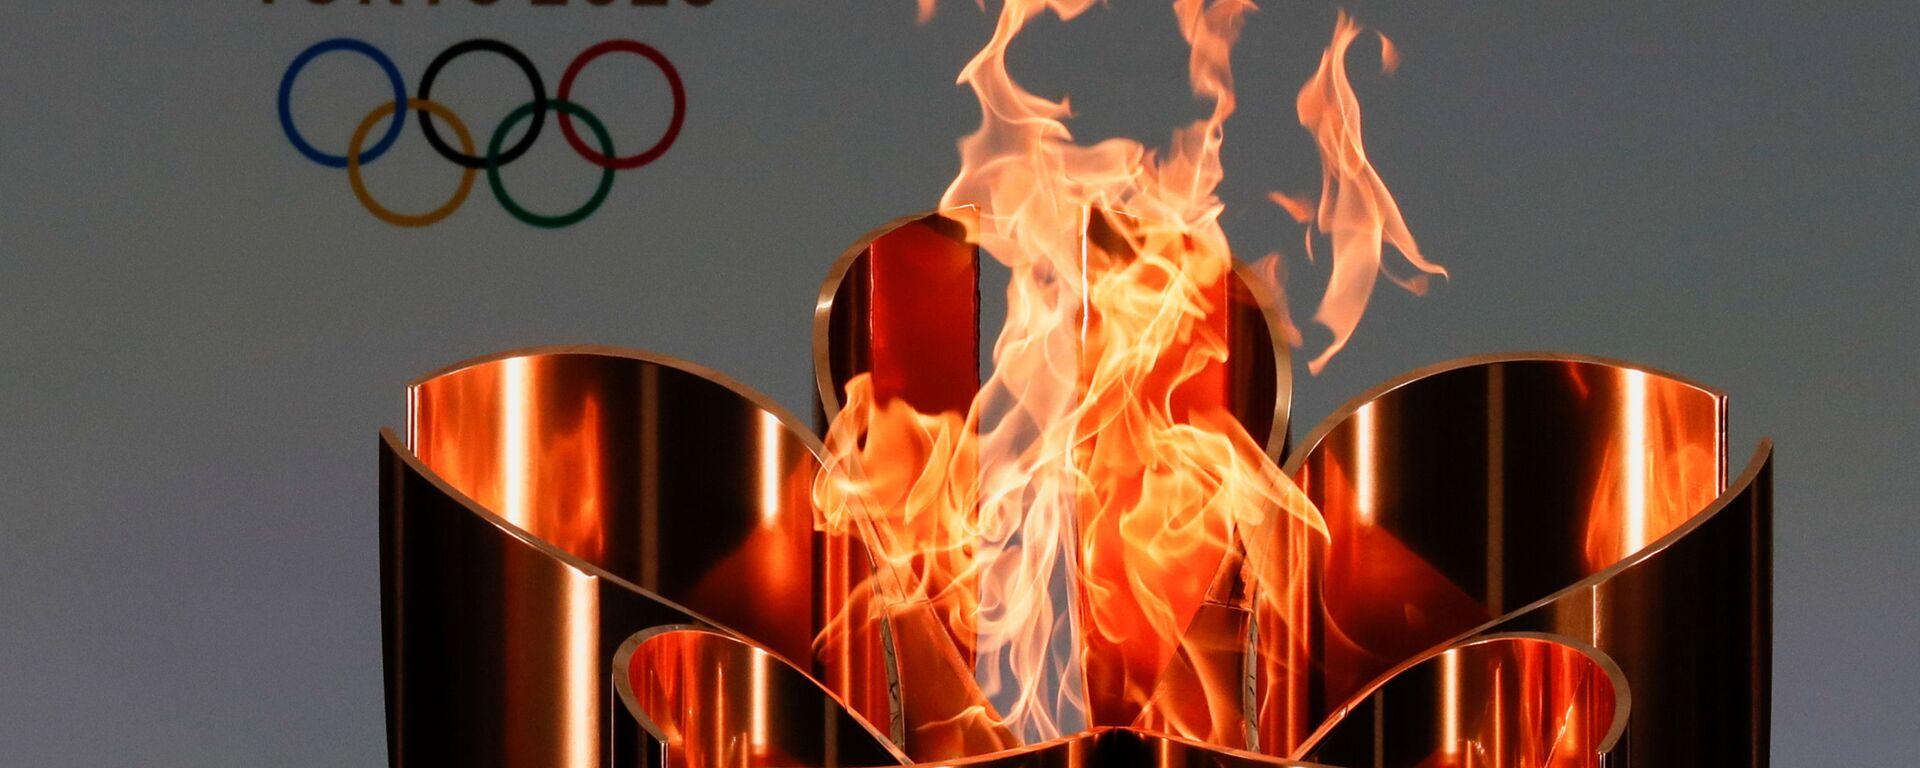 La fiaccola olimpica   - Sputnik Italia, 1920, 25.03.2021